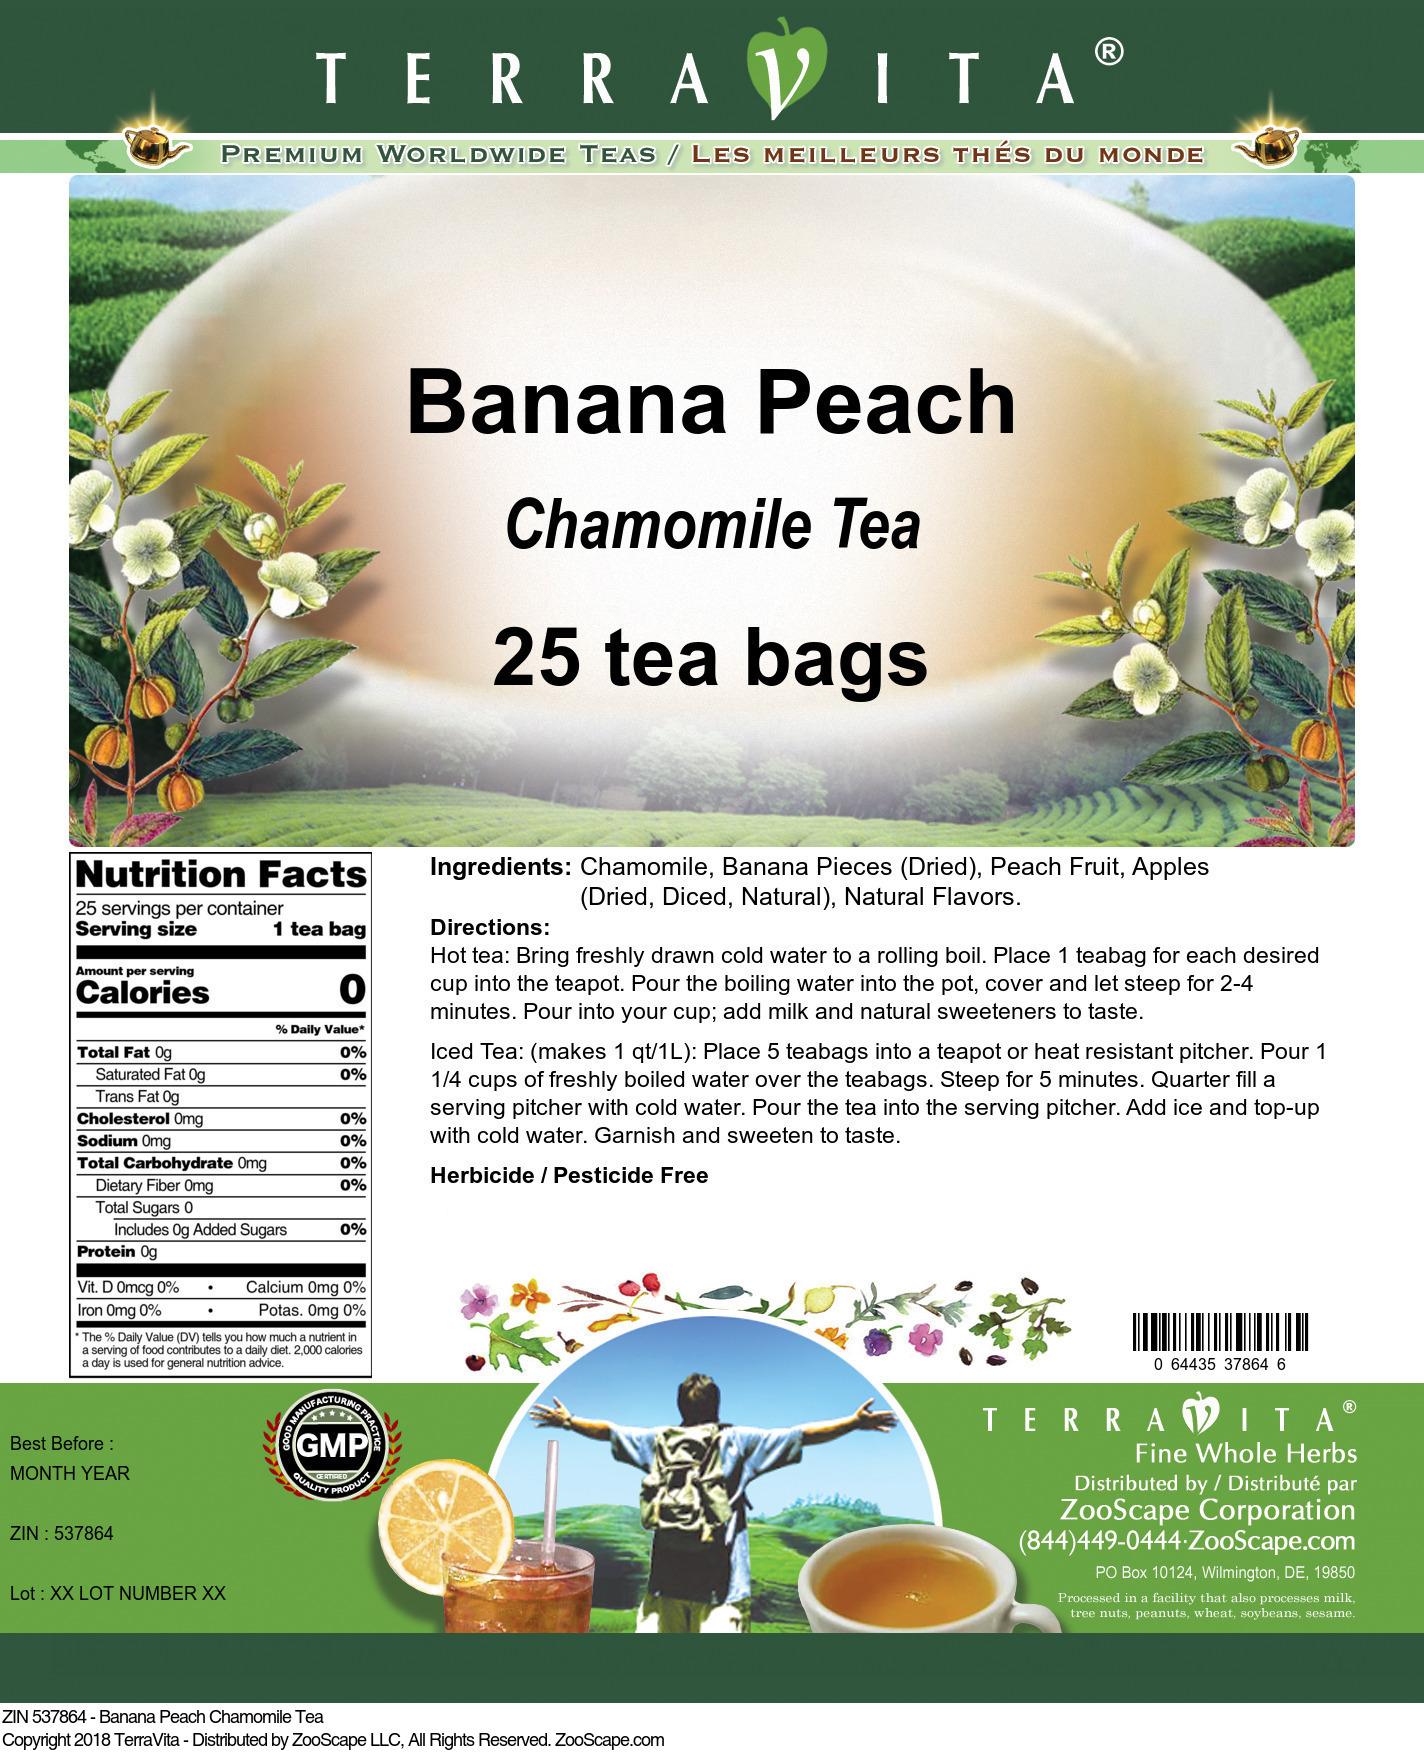 Banana Peach Chamomile Tea